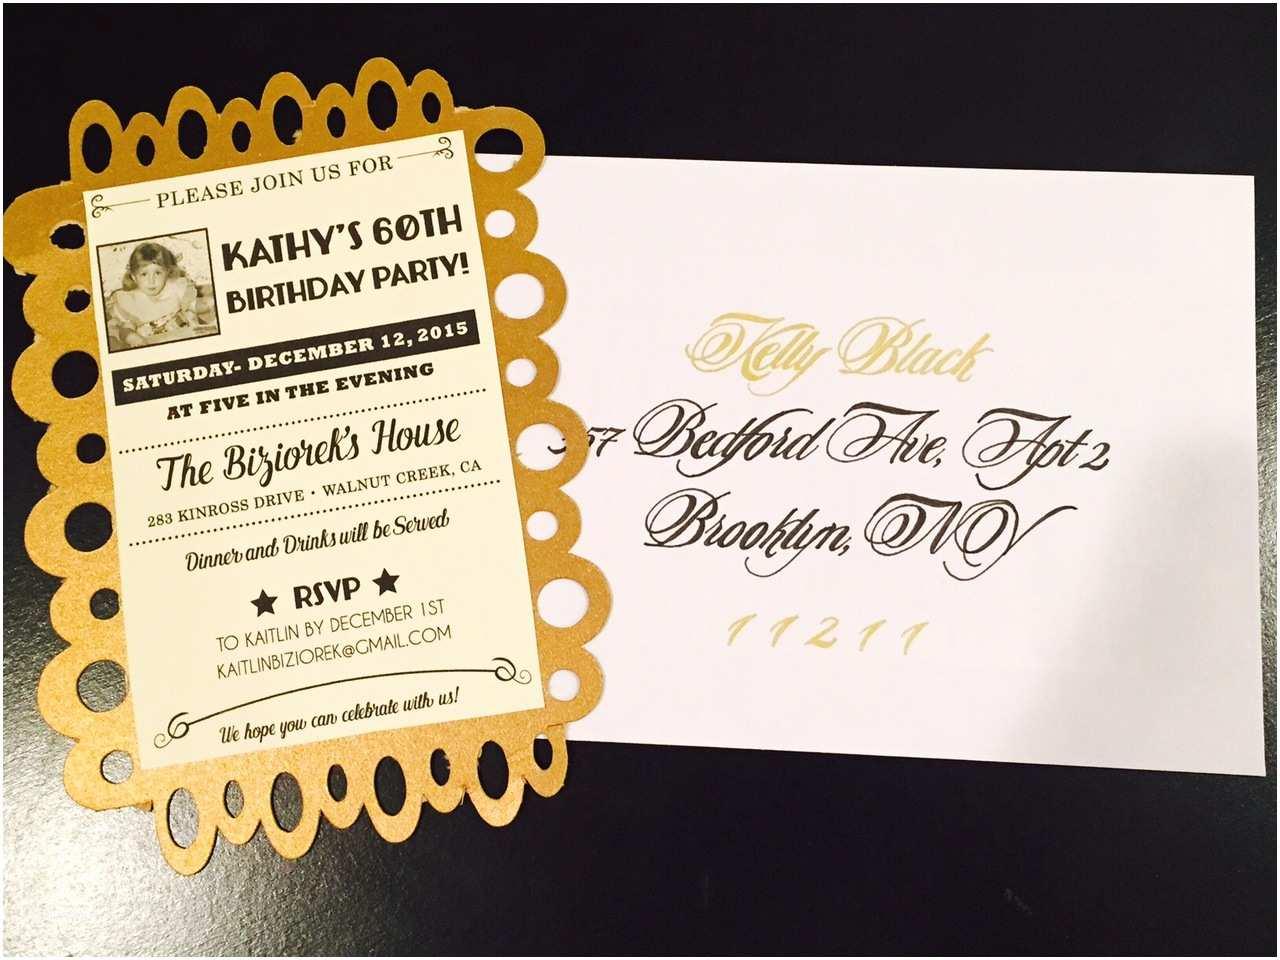 60th Birthday Invitation Ideas Golden Celebration 60th Birthday Party Ideas for Mom